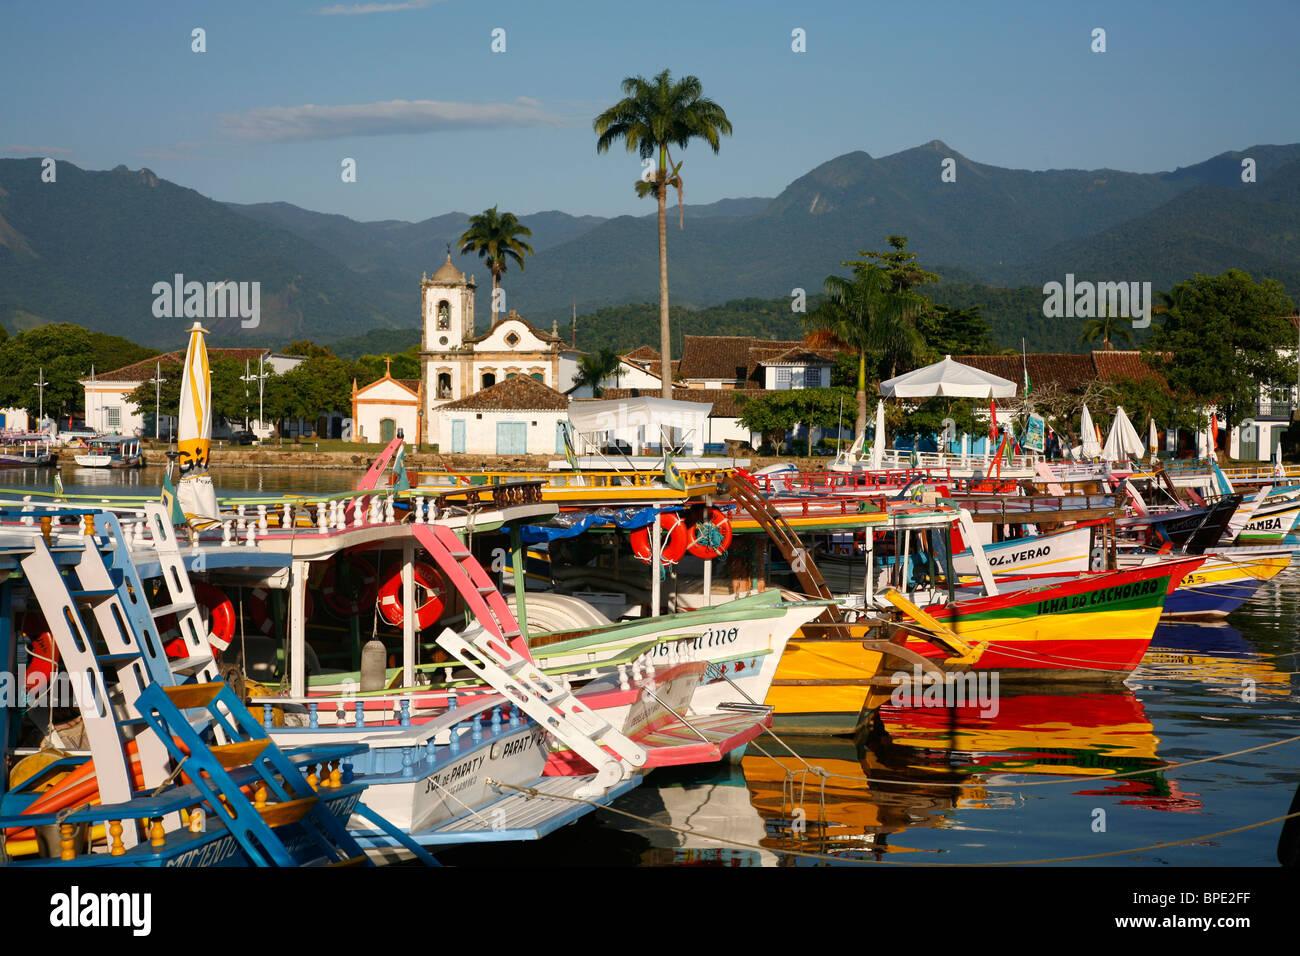 View over Santa Rita church and the harbour, Paraty, Rio de Janeiro State, Brazil. - Stock Image